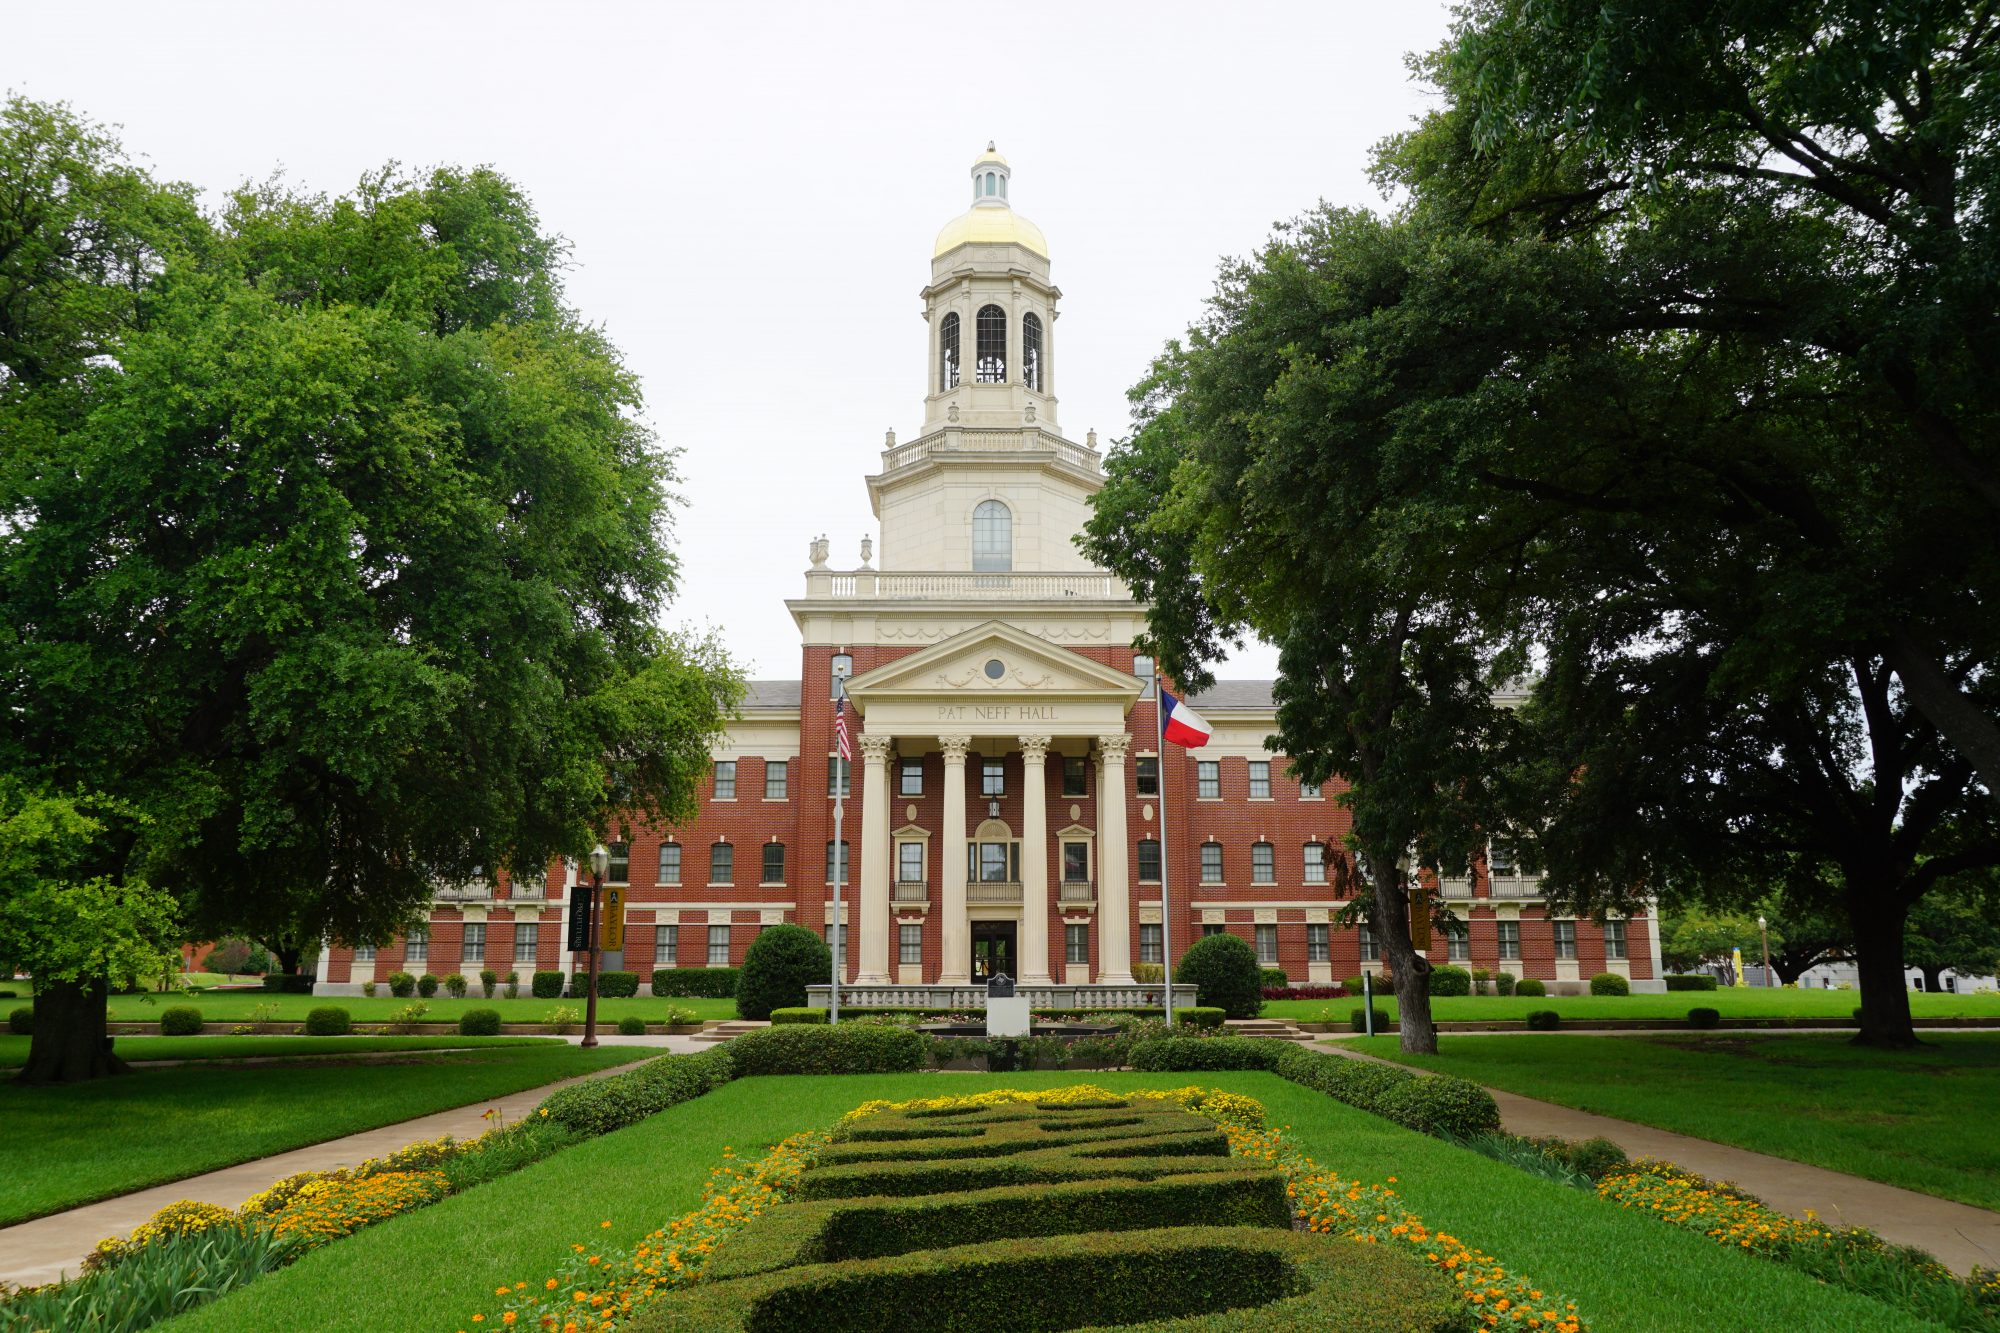 Baylor University, photo by Michael Barera